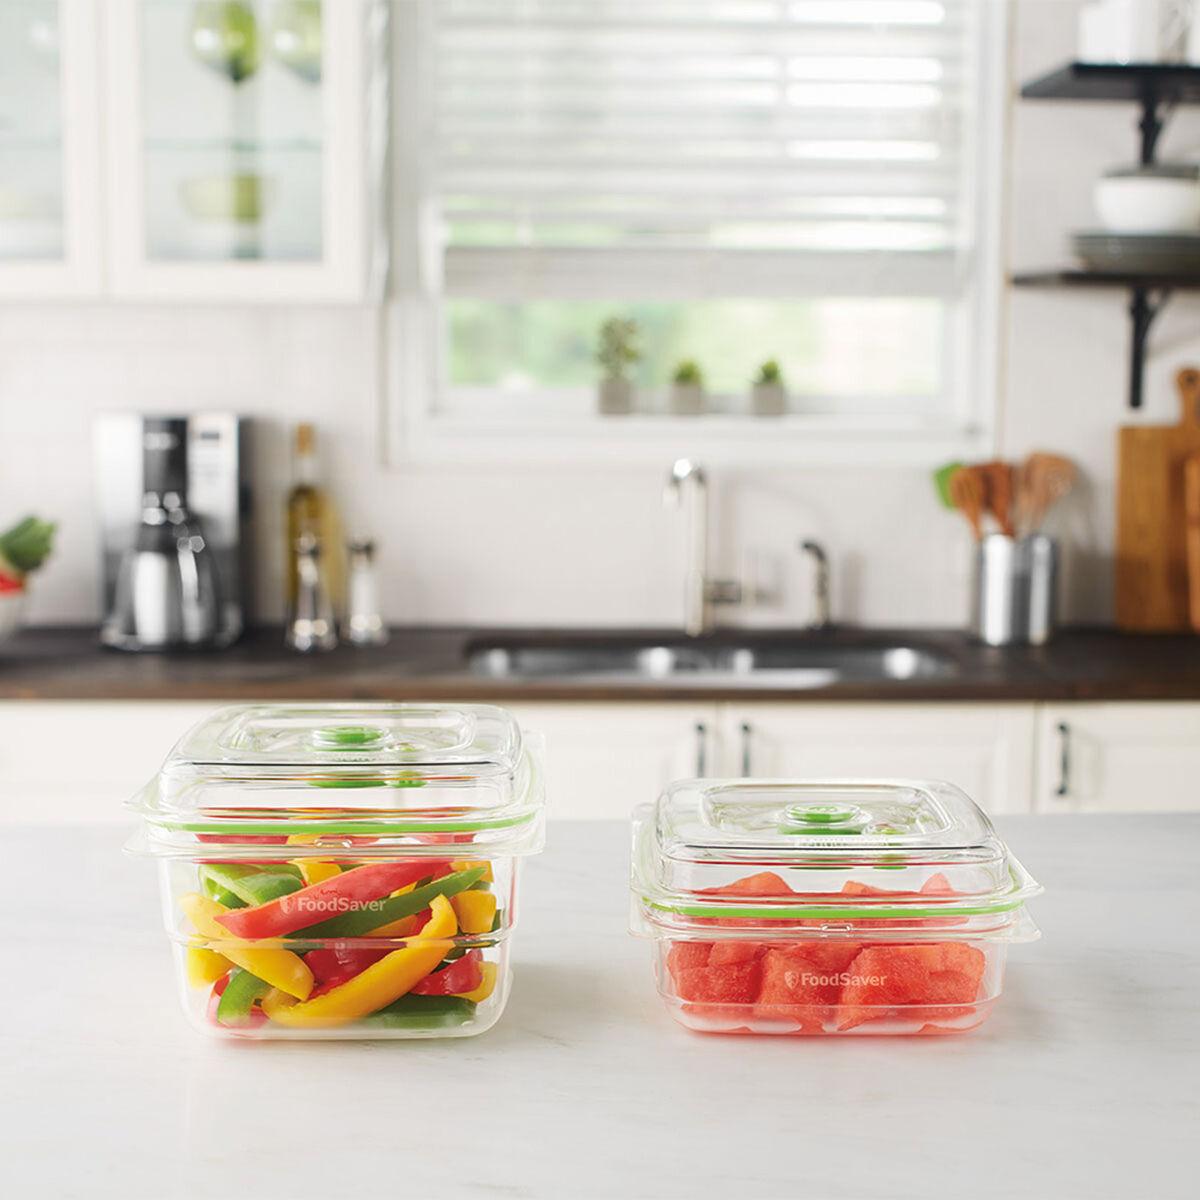 Set 2 Contenedores Fresh Oster FoodSaver® FFC015X